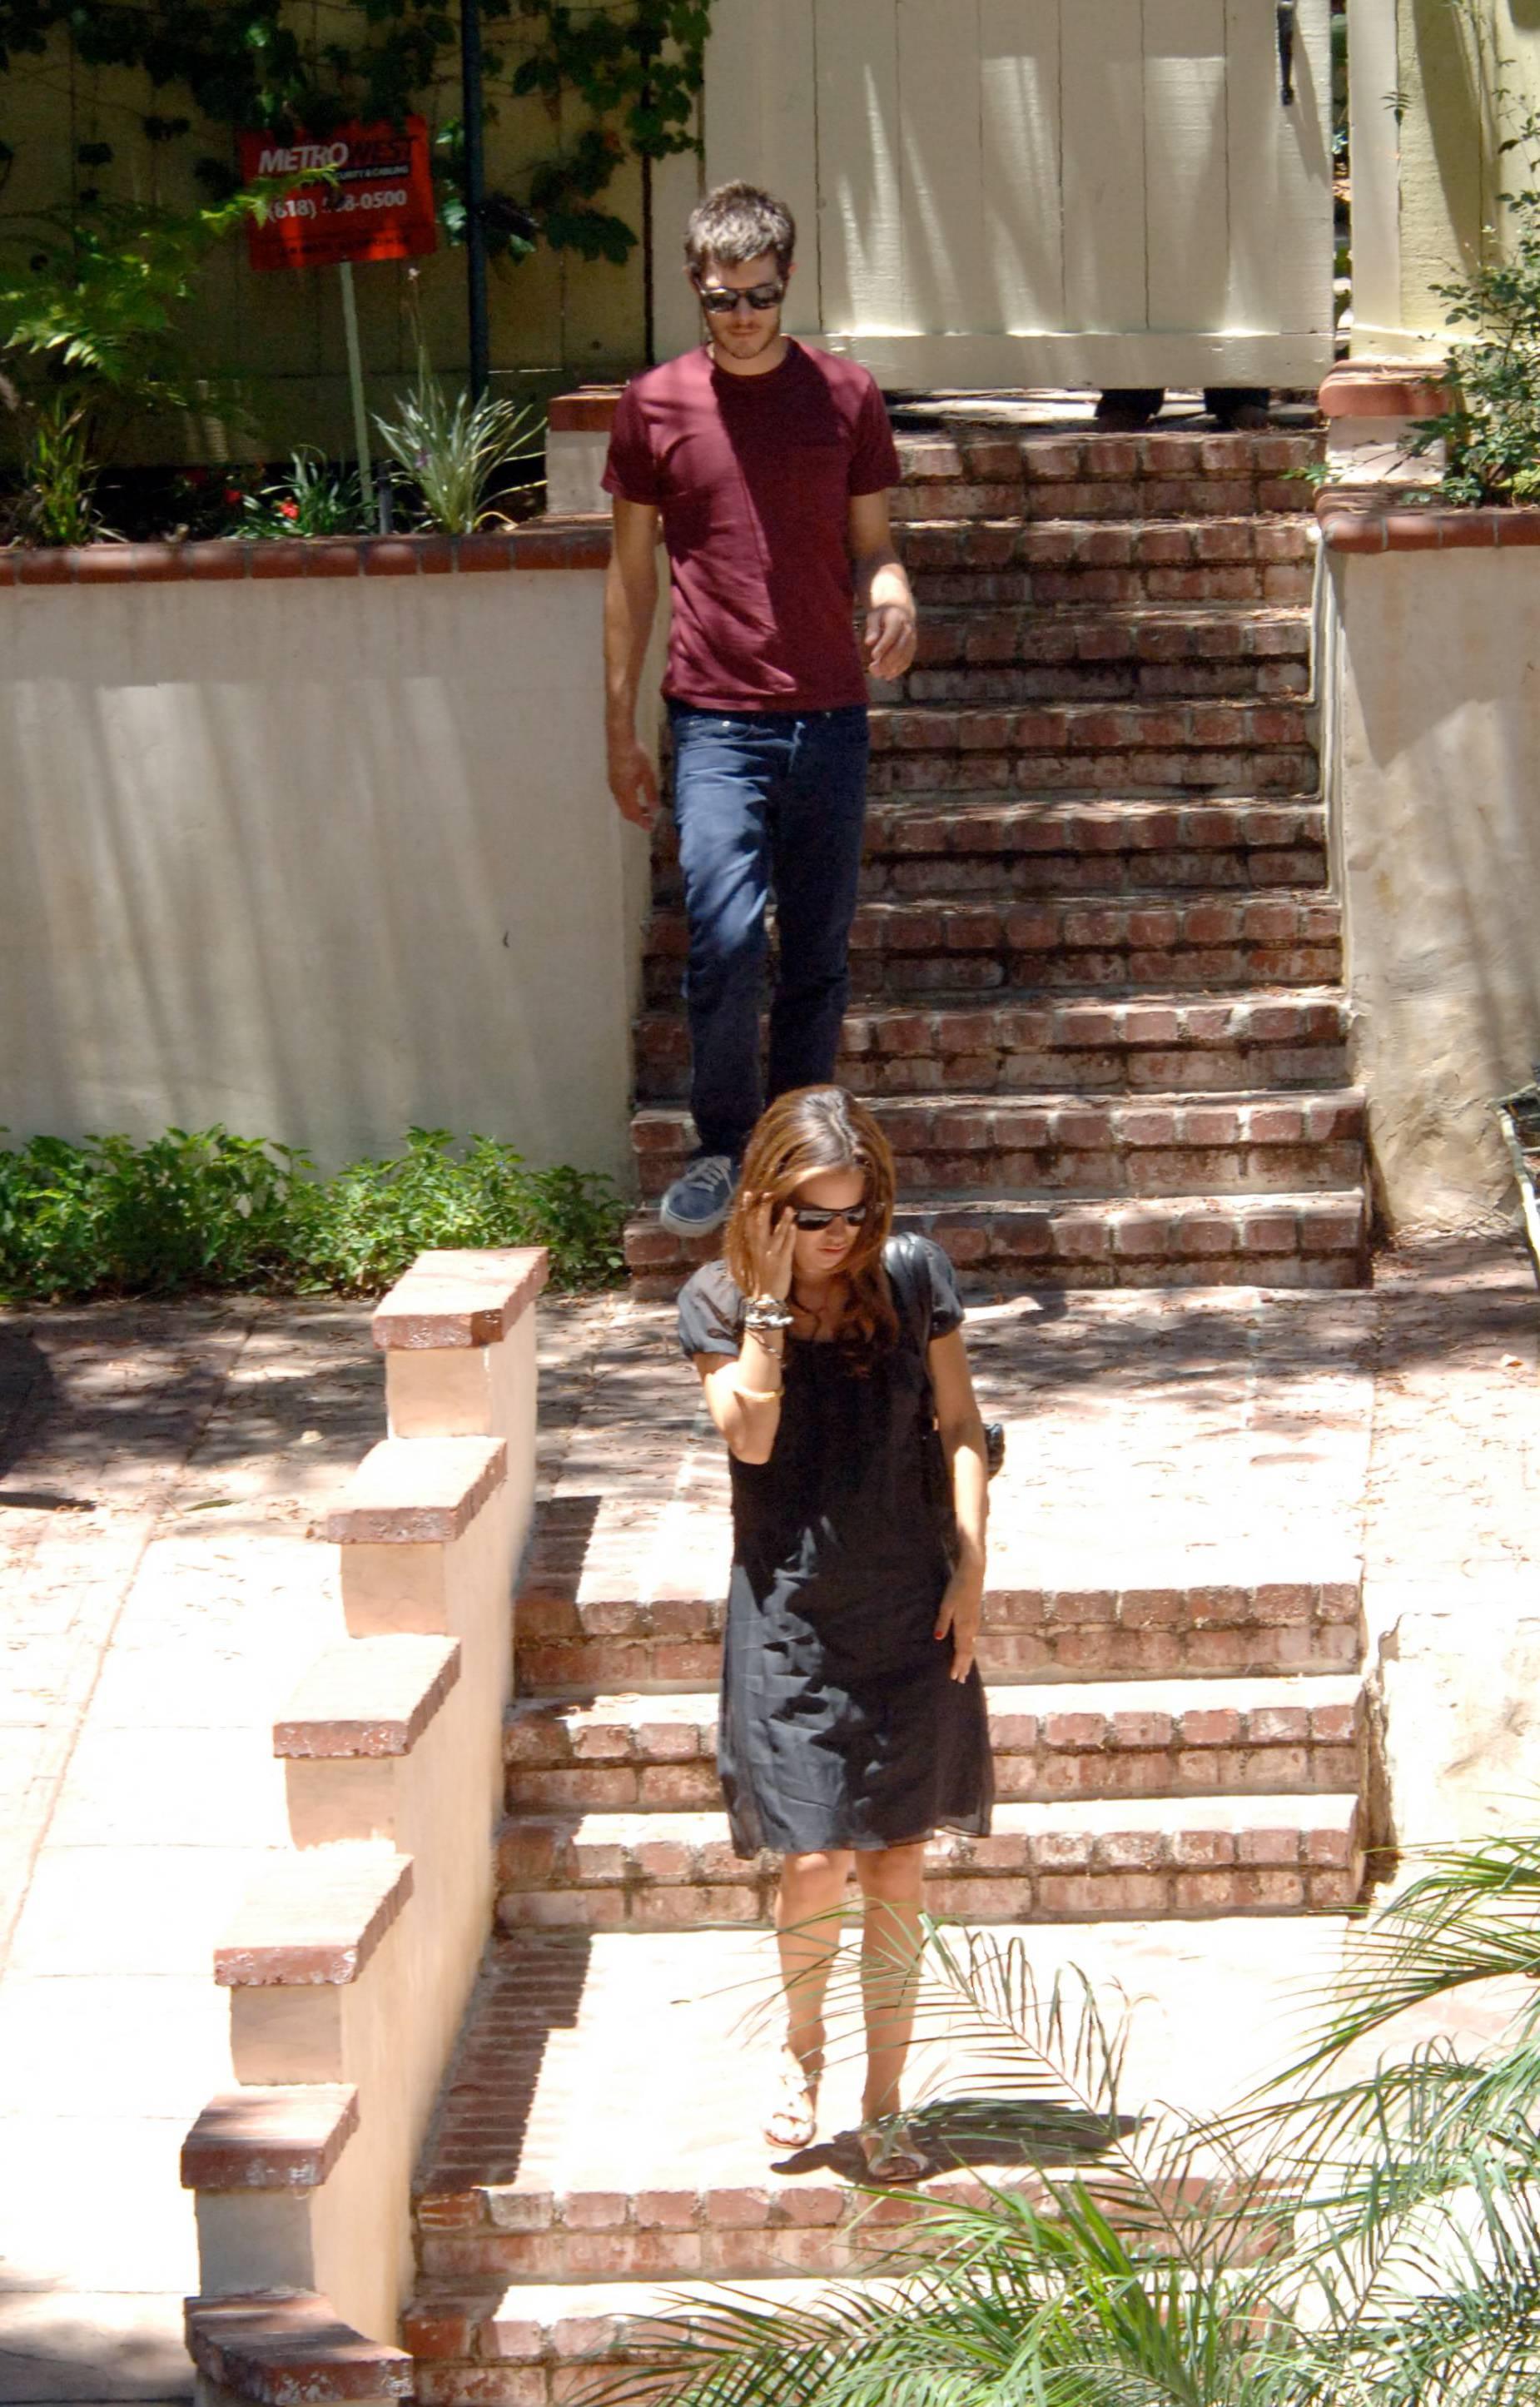 73183_Rachel_Bilson_with_her_sister_in_Hollywood_05_552lo.jpg